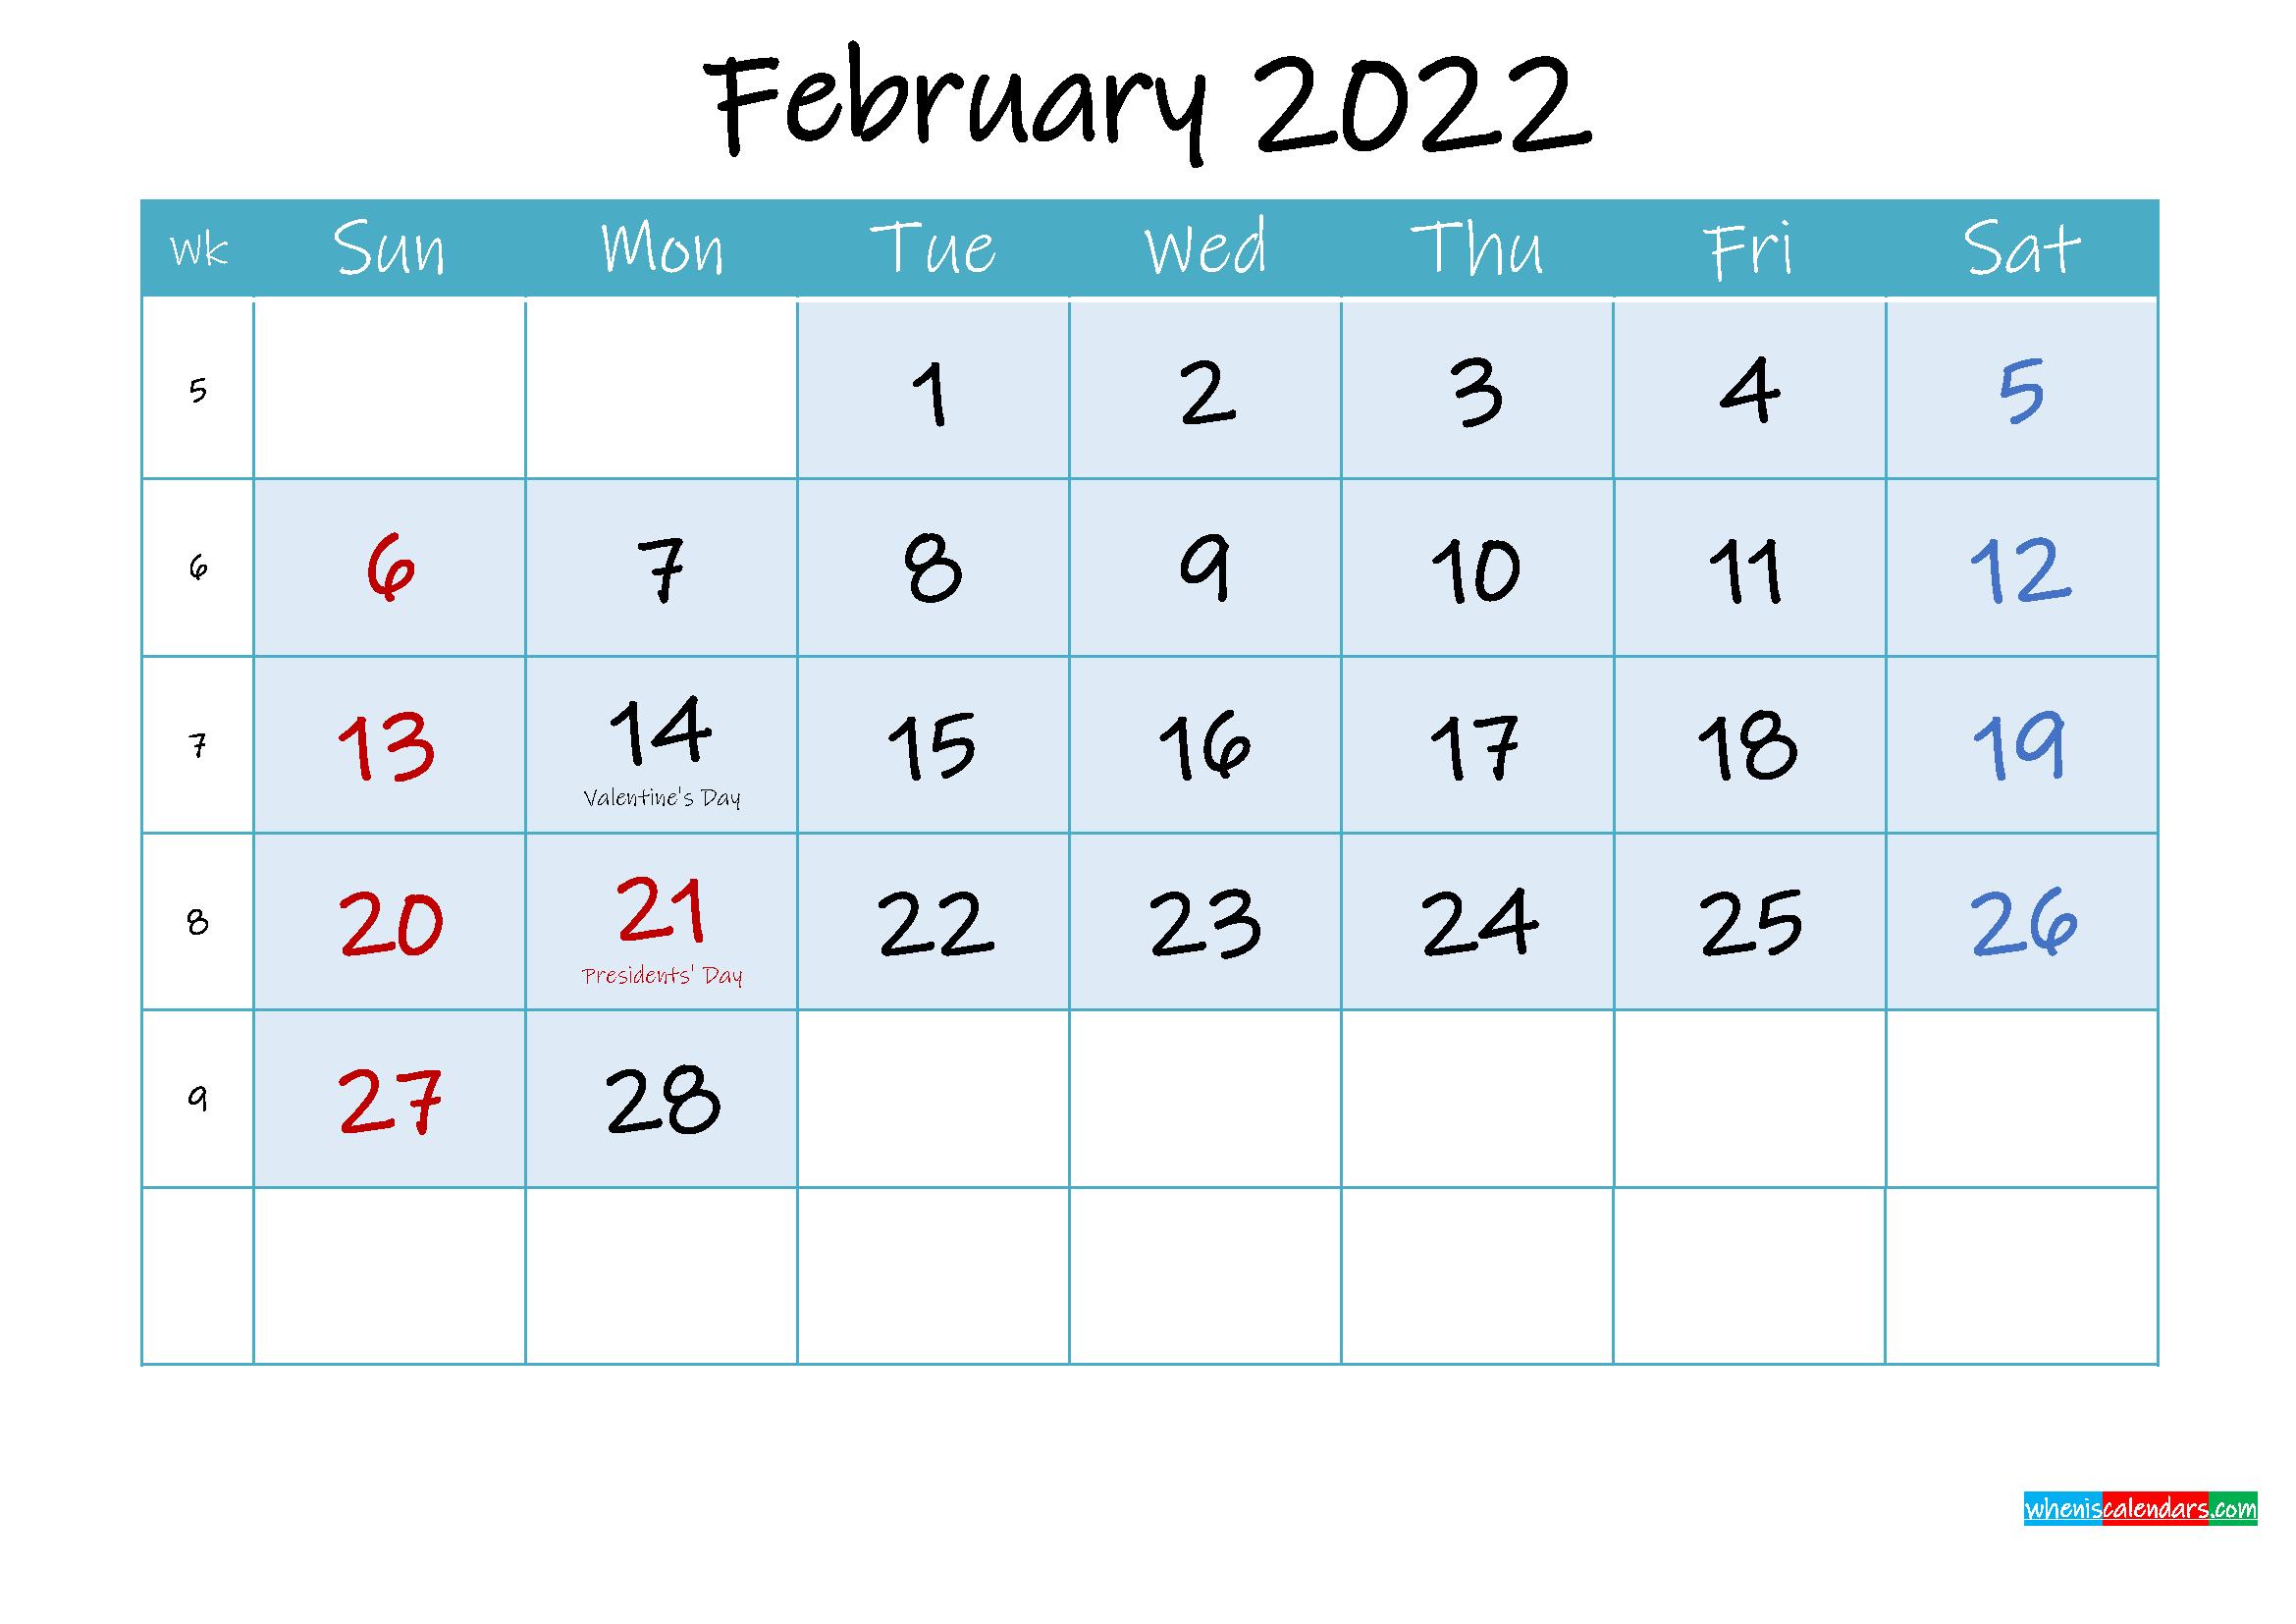 February 2022 Free Printable Calendar with Holidays